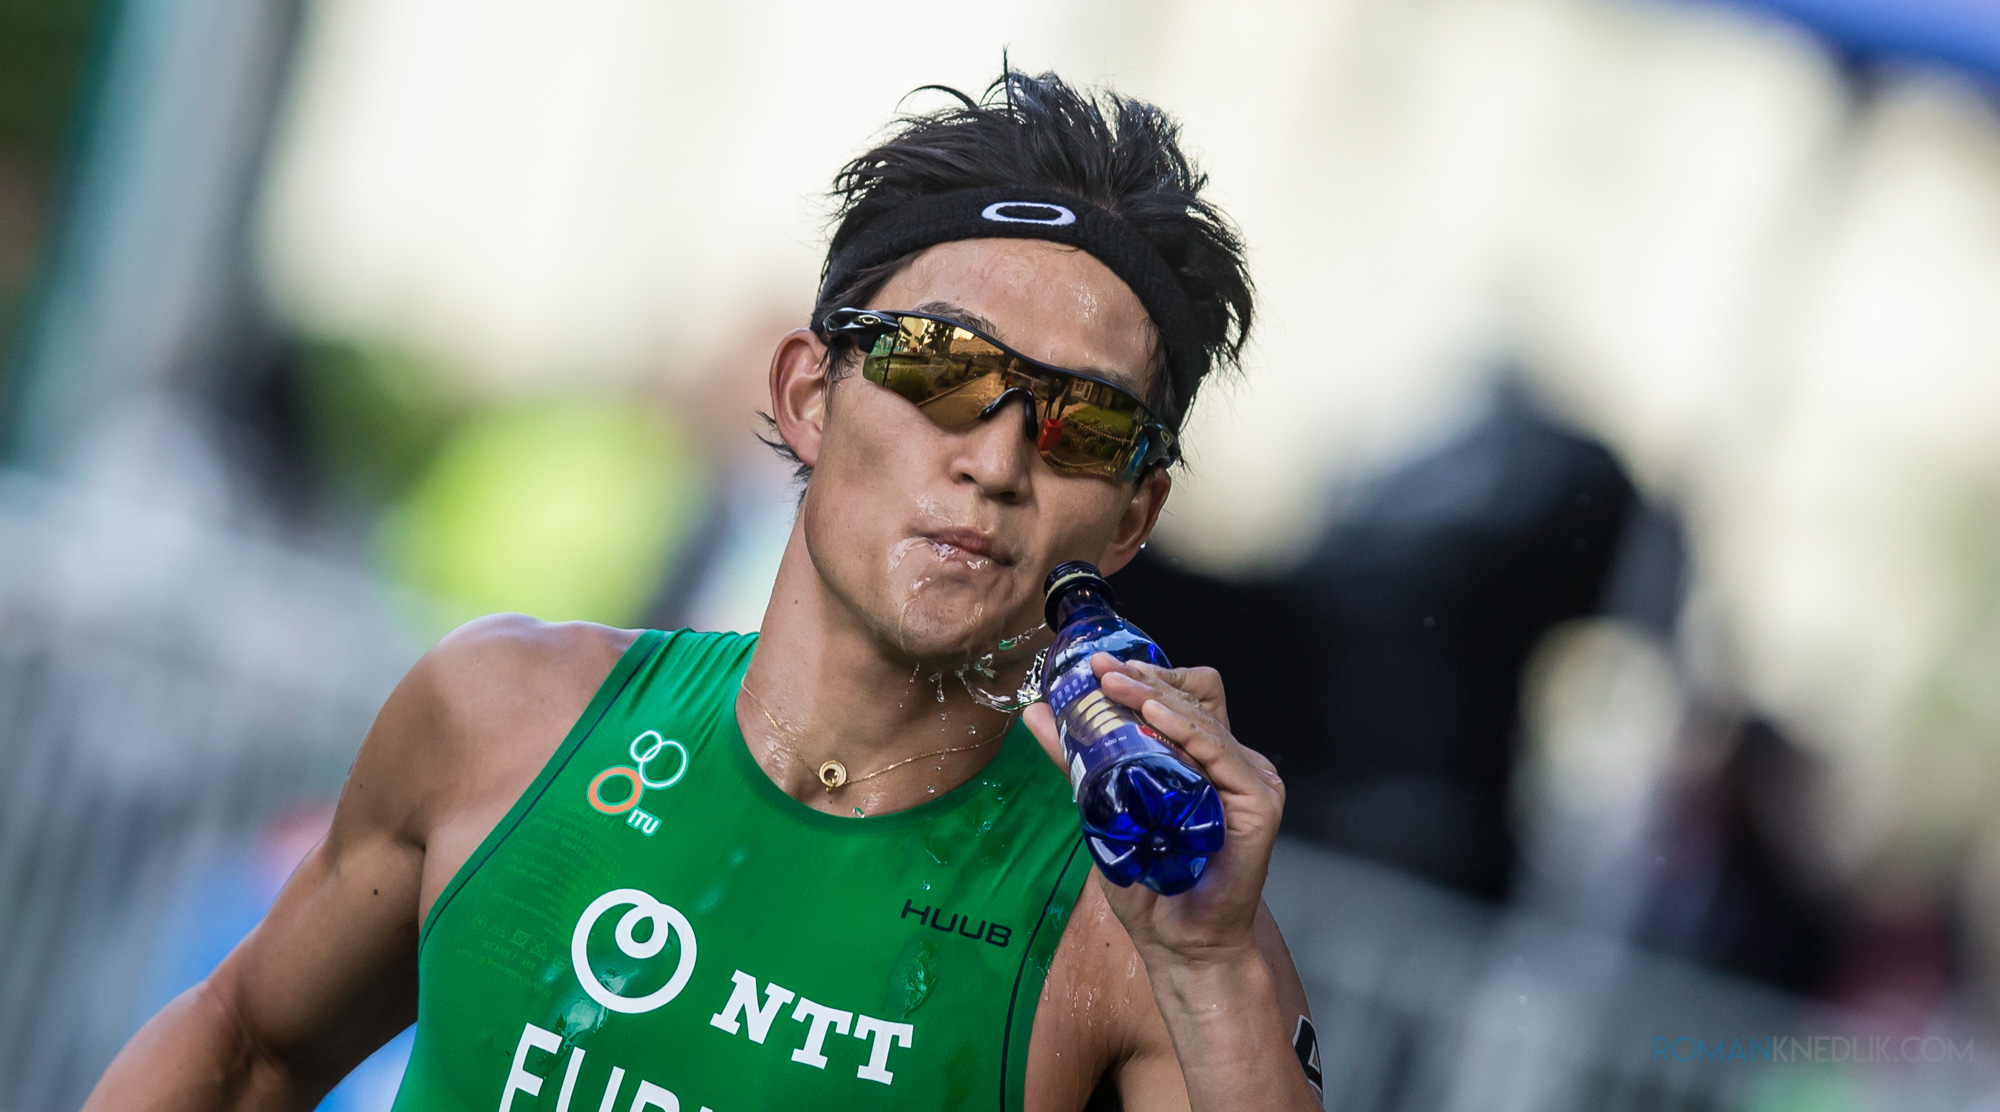 ICU_World_Cup_Triathlon_KV-46